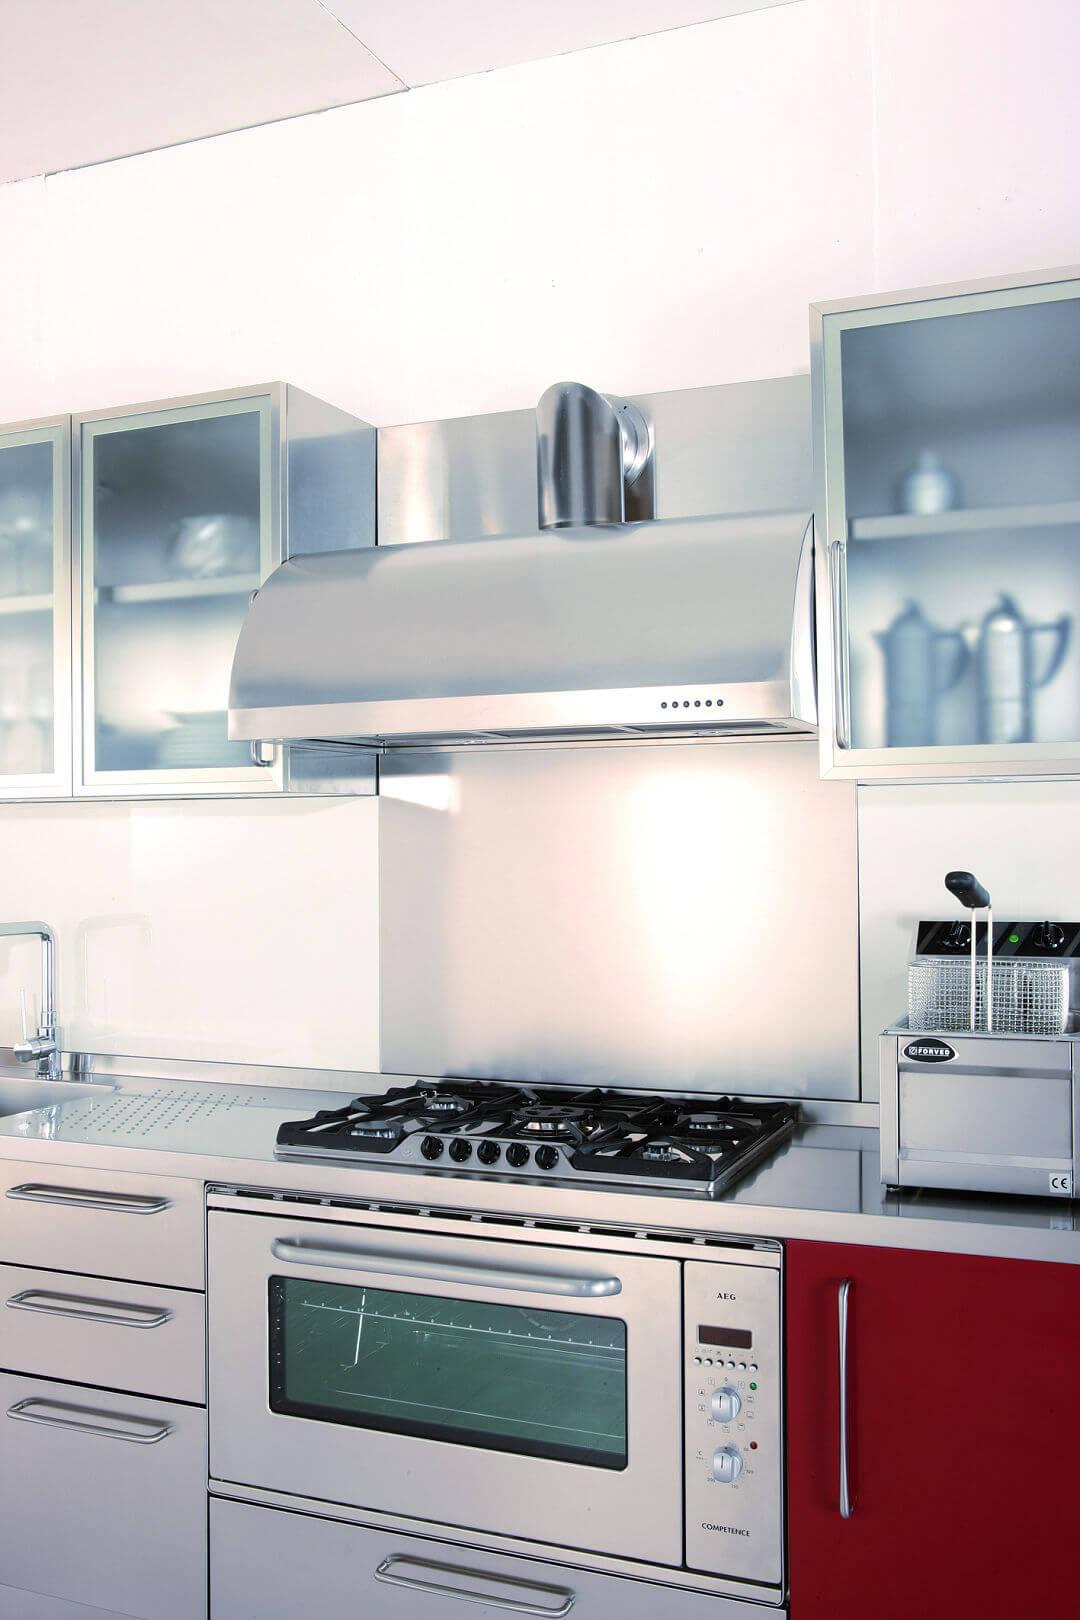 Mobili cucina italiana gallery of cucine elegante e for Cucina italiana mobili